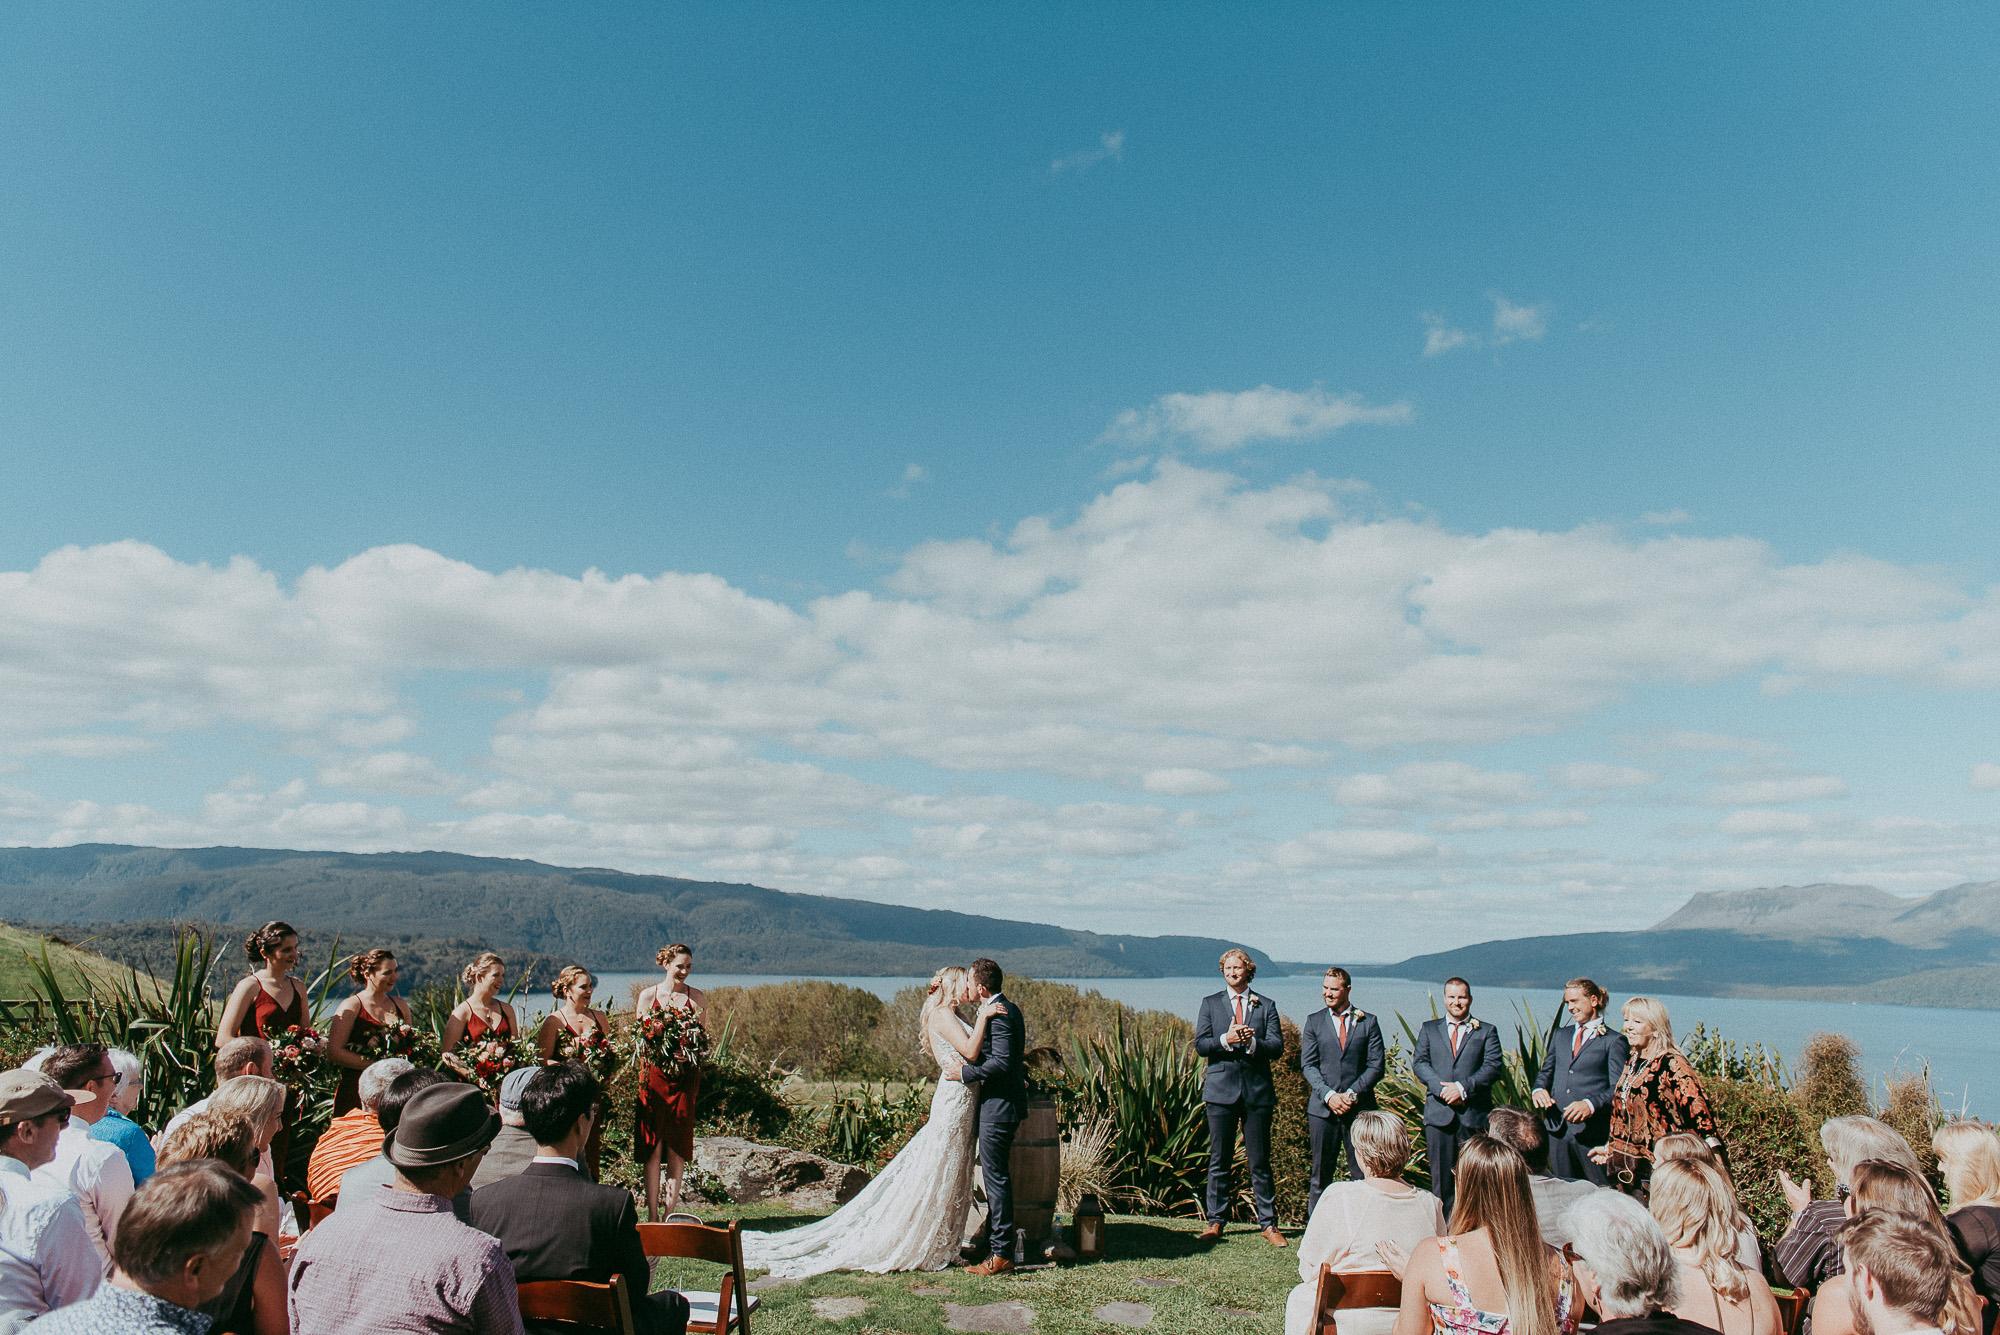 wedding-by-levien-435.JPG